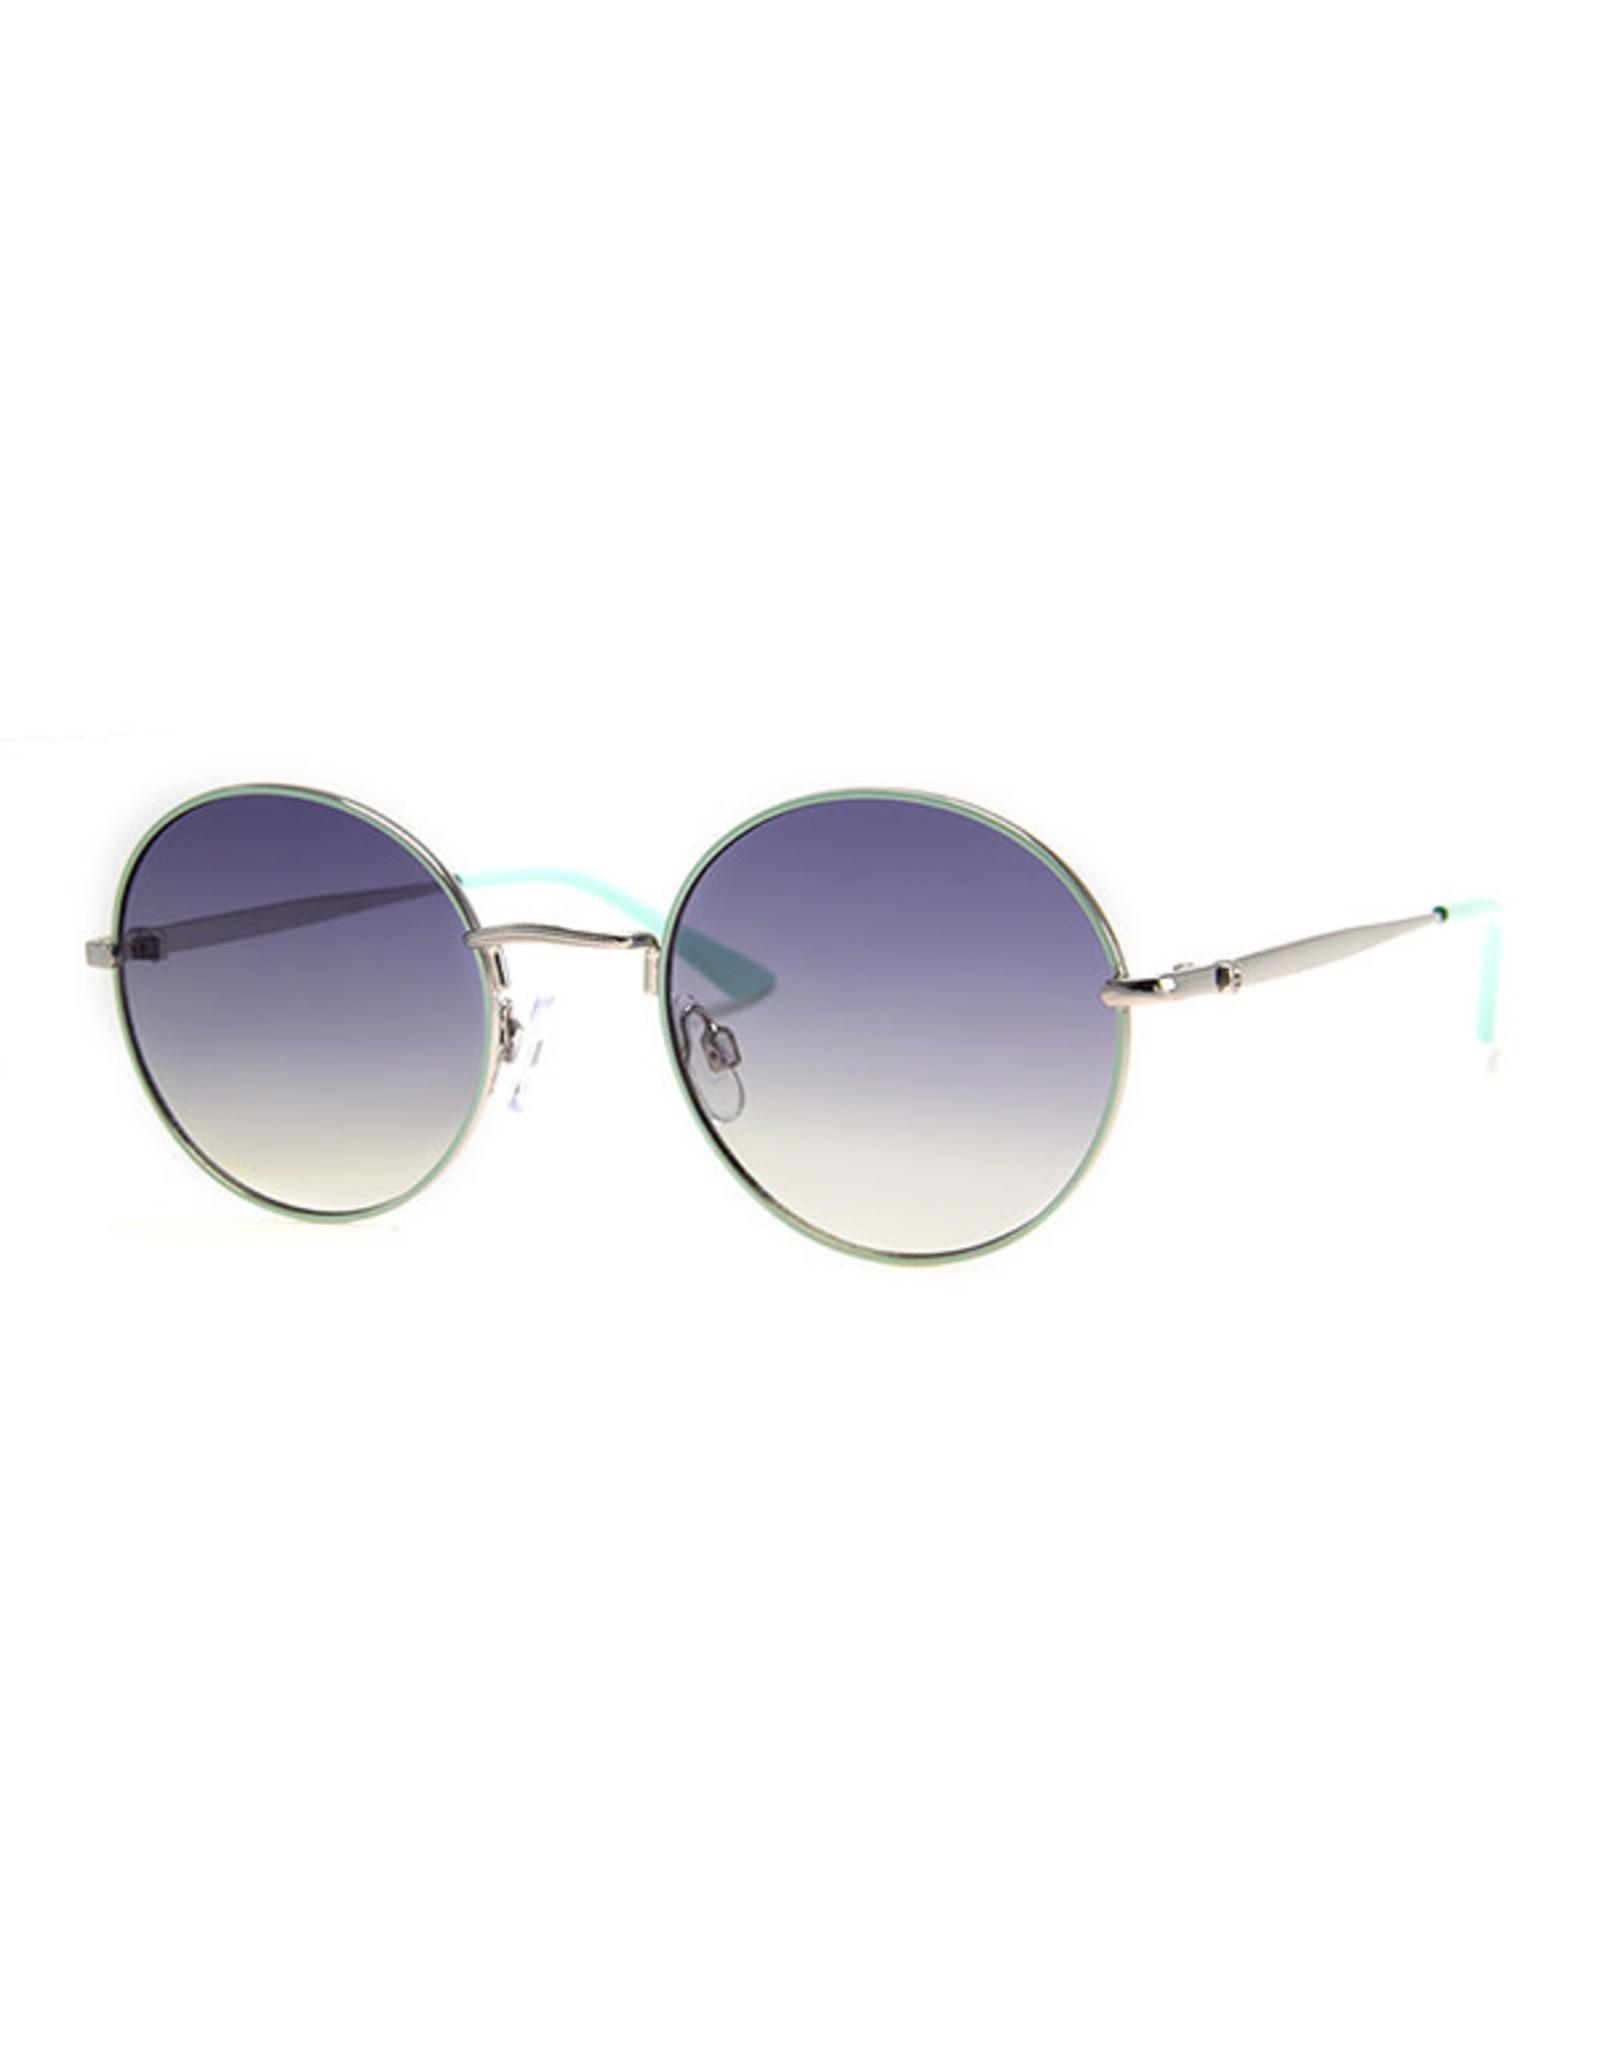 AJ Morgan AJM - Round Colored Wire Frame Sunglasses